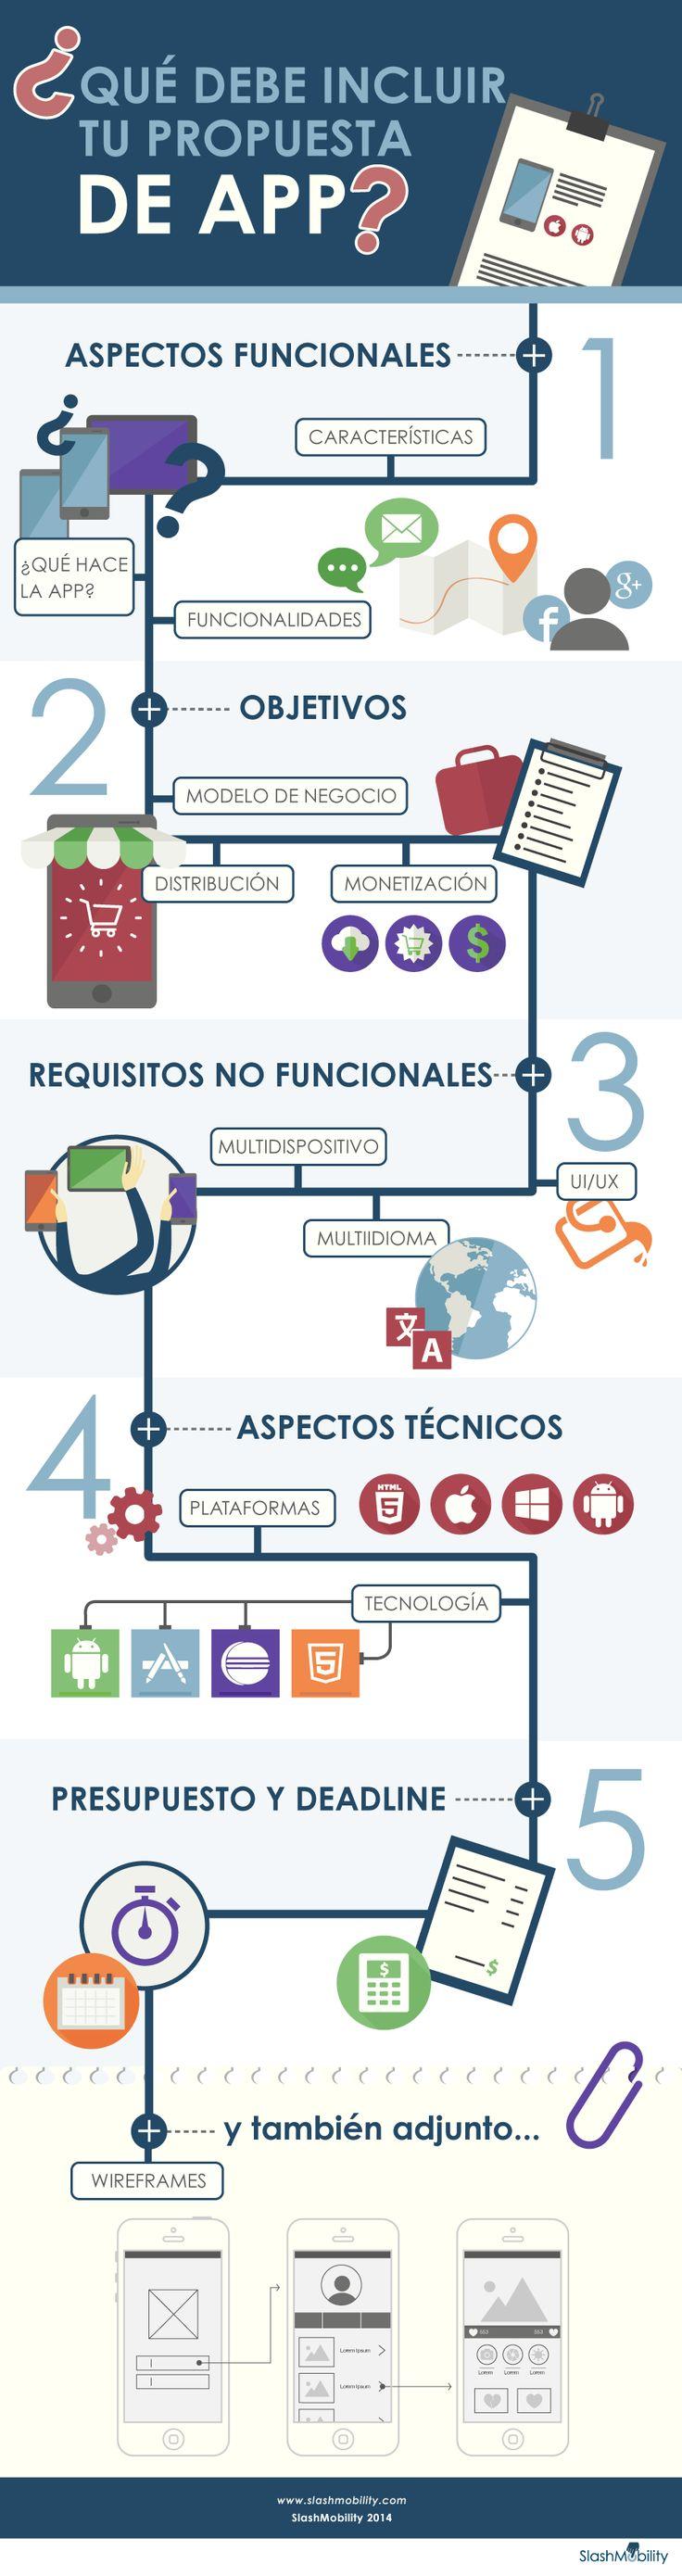 infografia_briefing_es